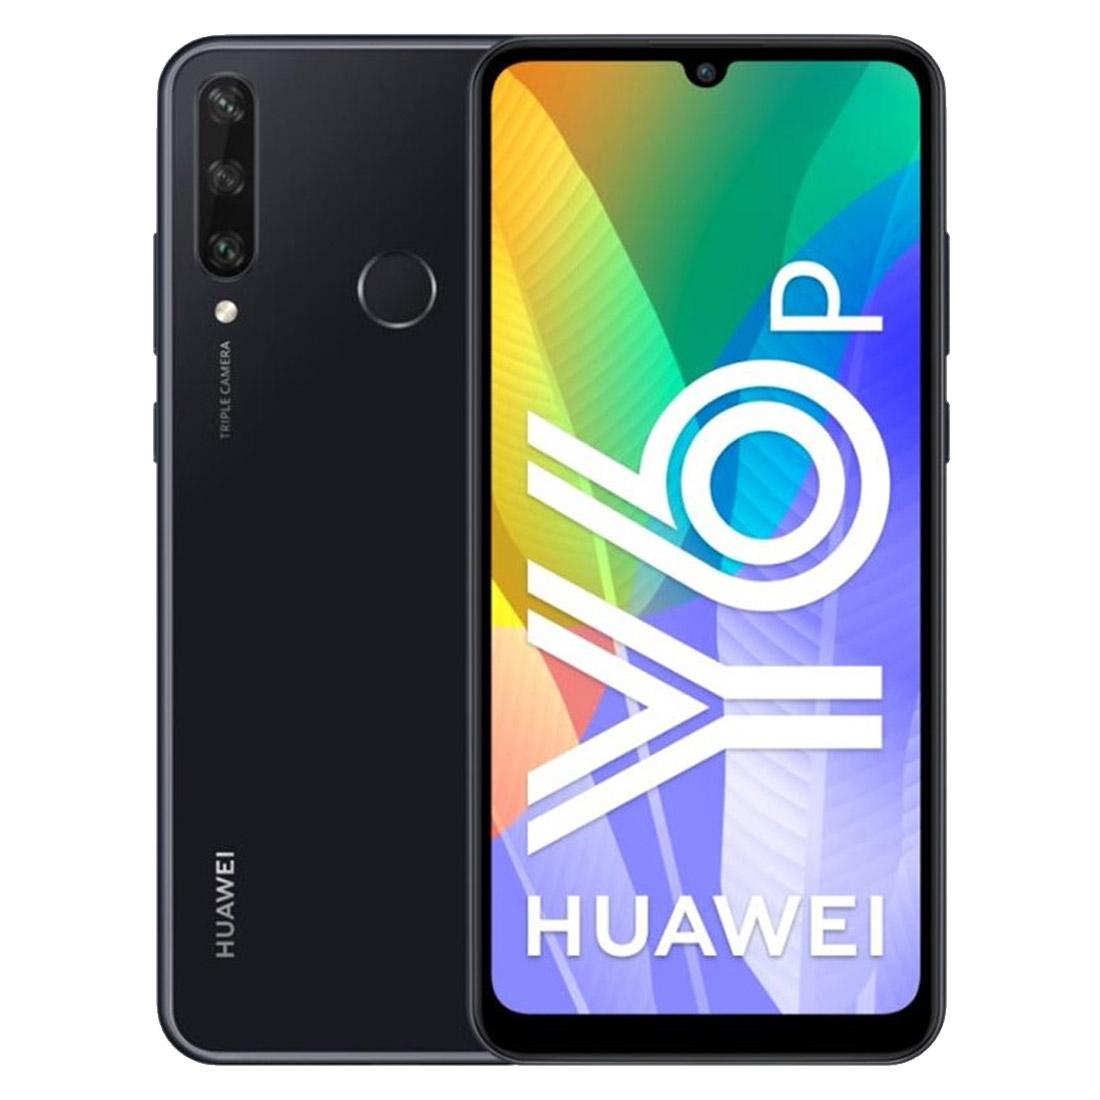 "Huawei Y6P (HMS, Dual Sim 4G, 6.3"", 64GB/3GB) - Midnight Black"